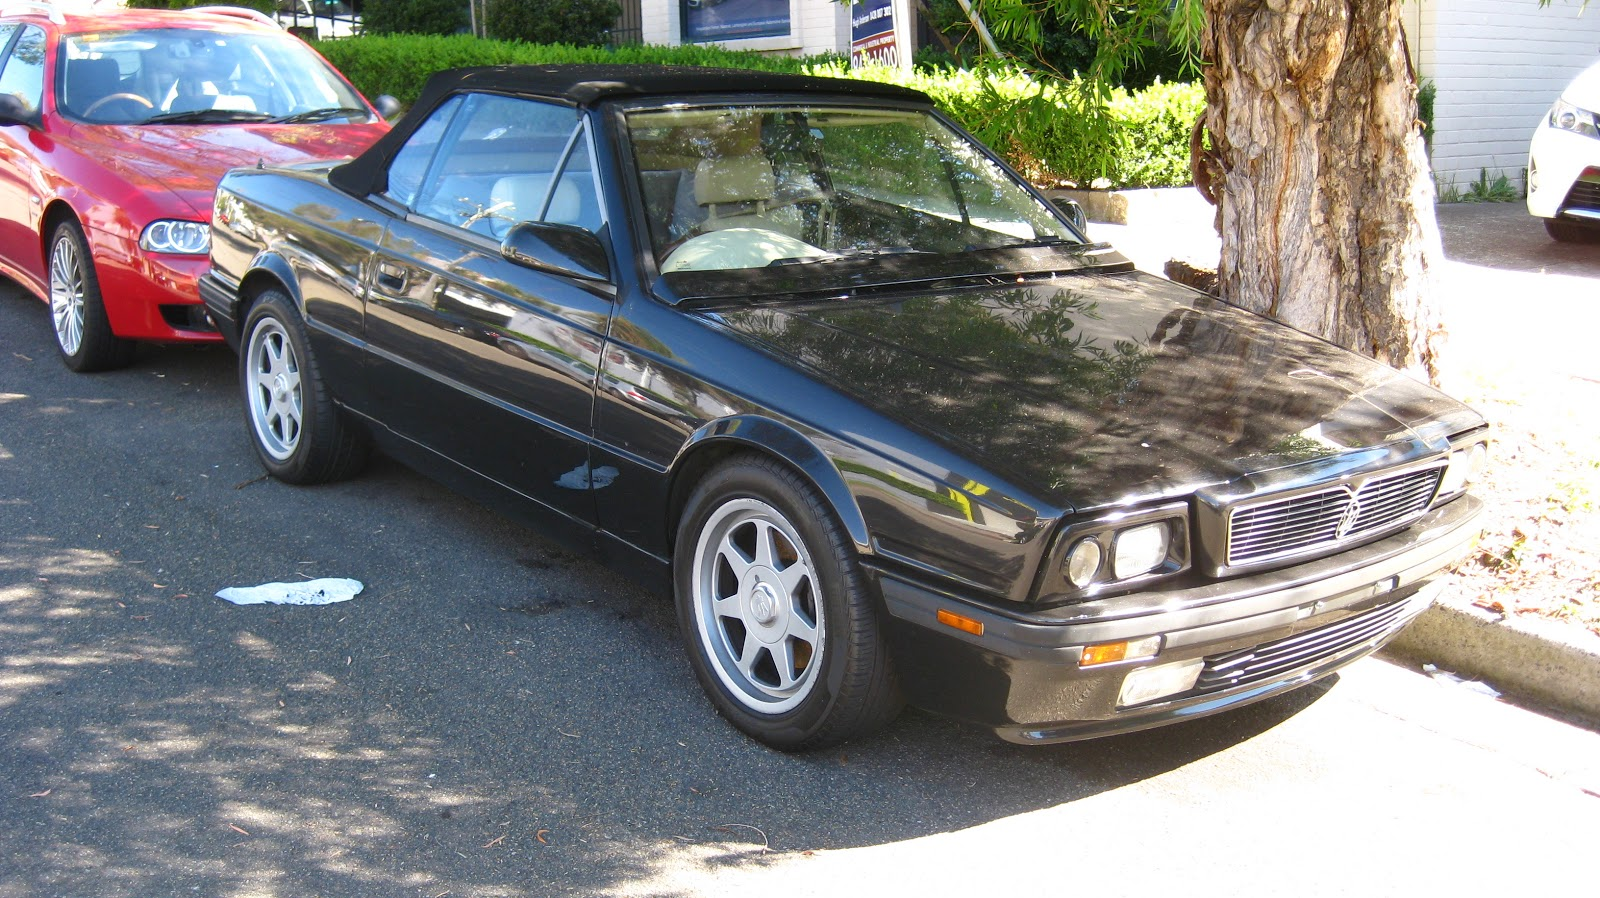 Aussie Old Parked Cars: 1992 Maserati Biturbo Spyder lll 2.8